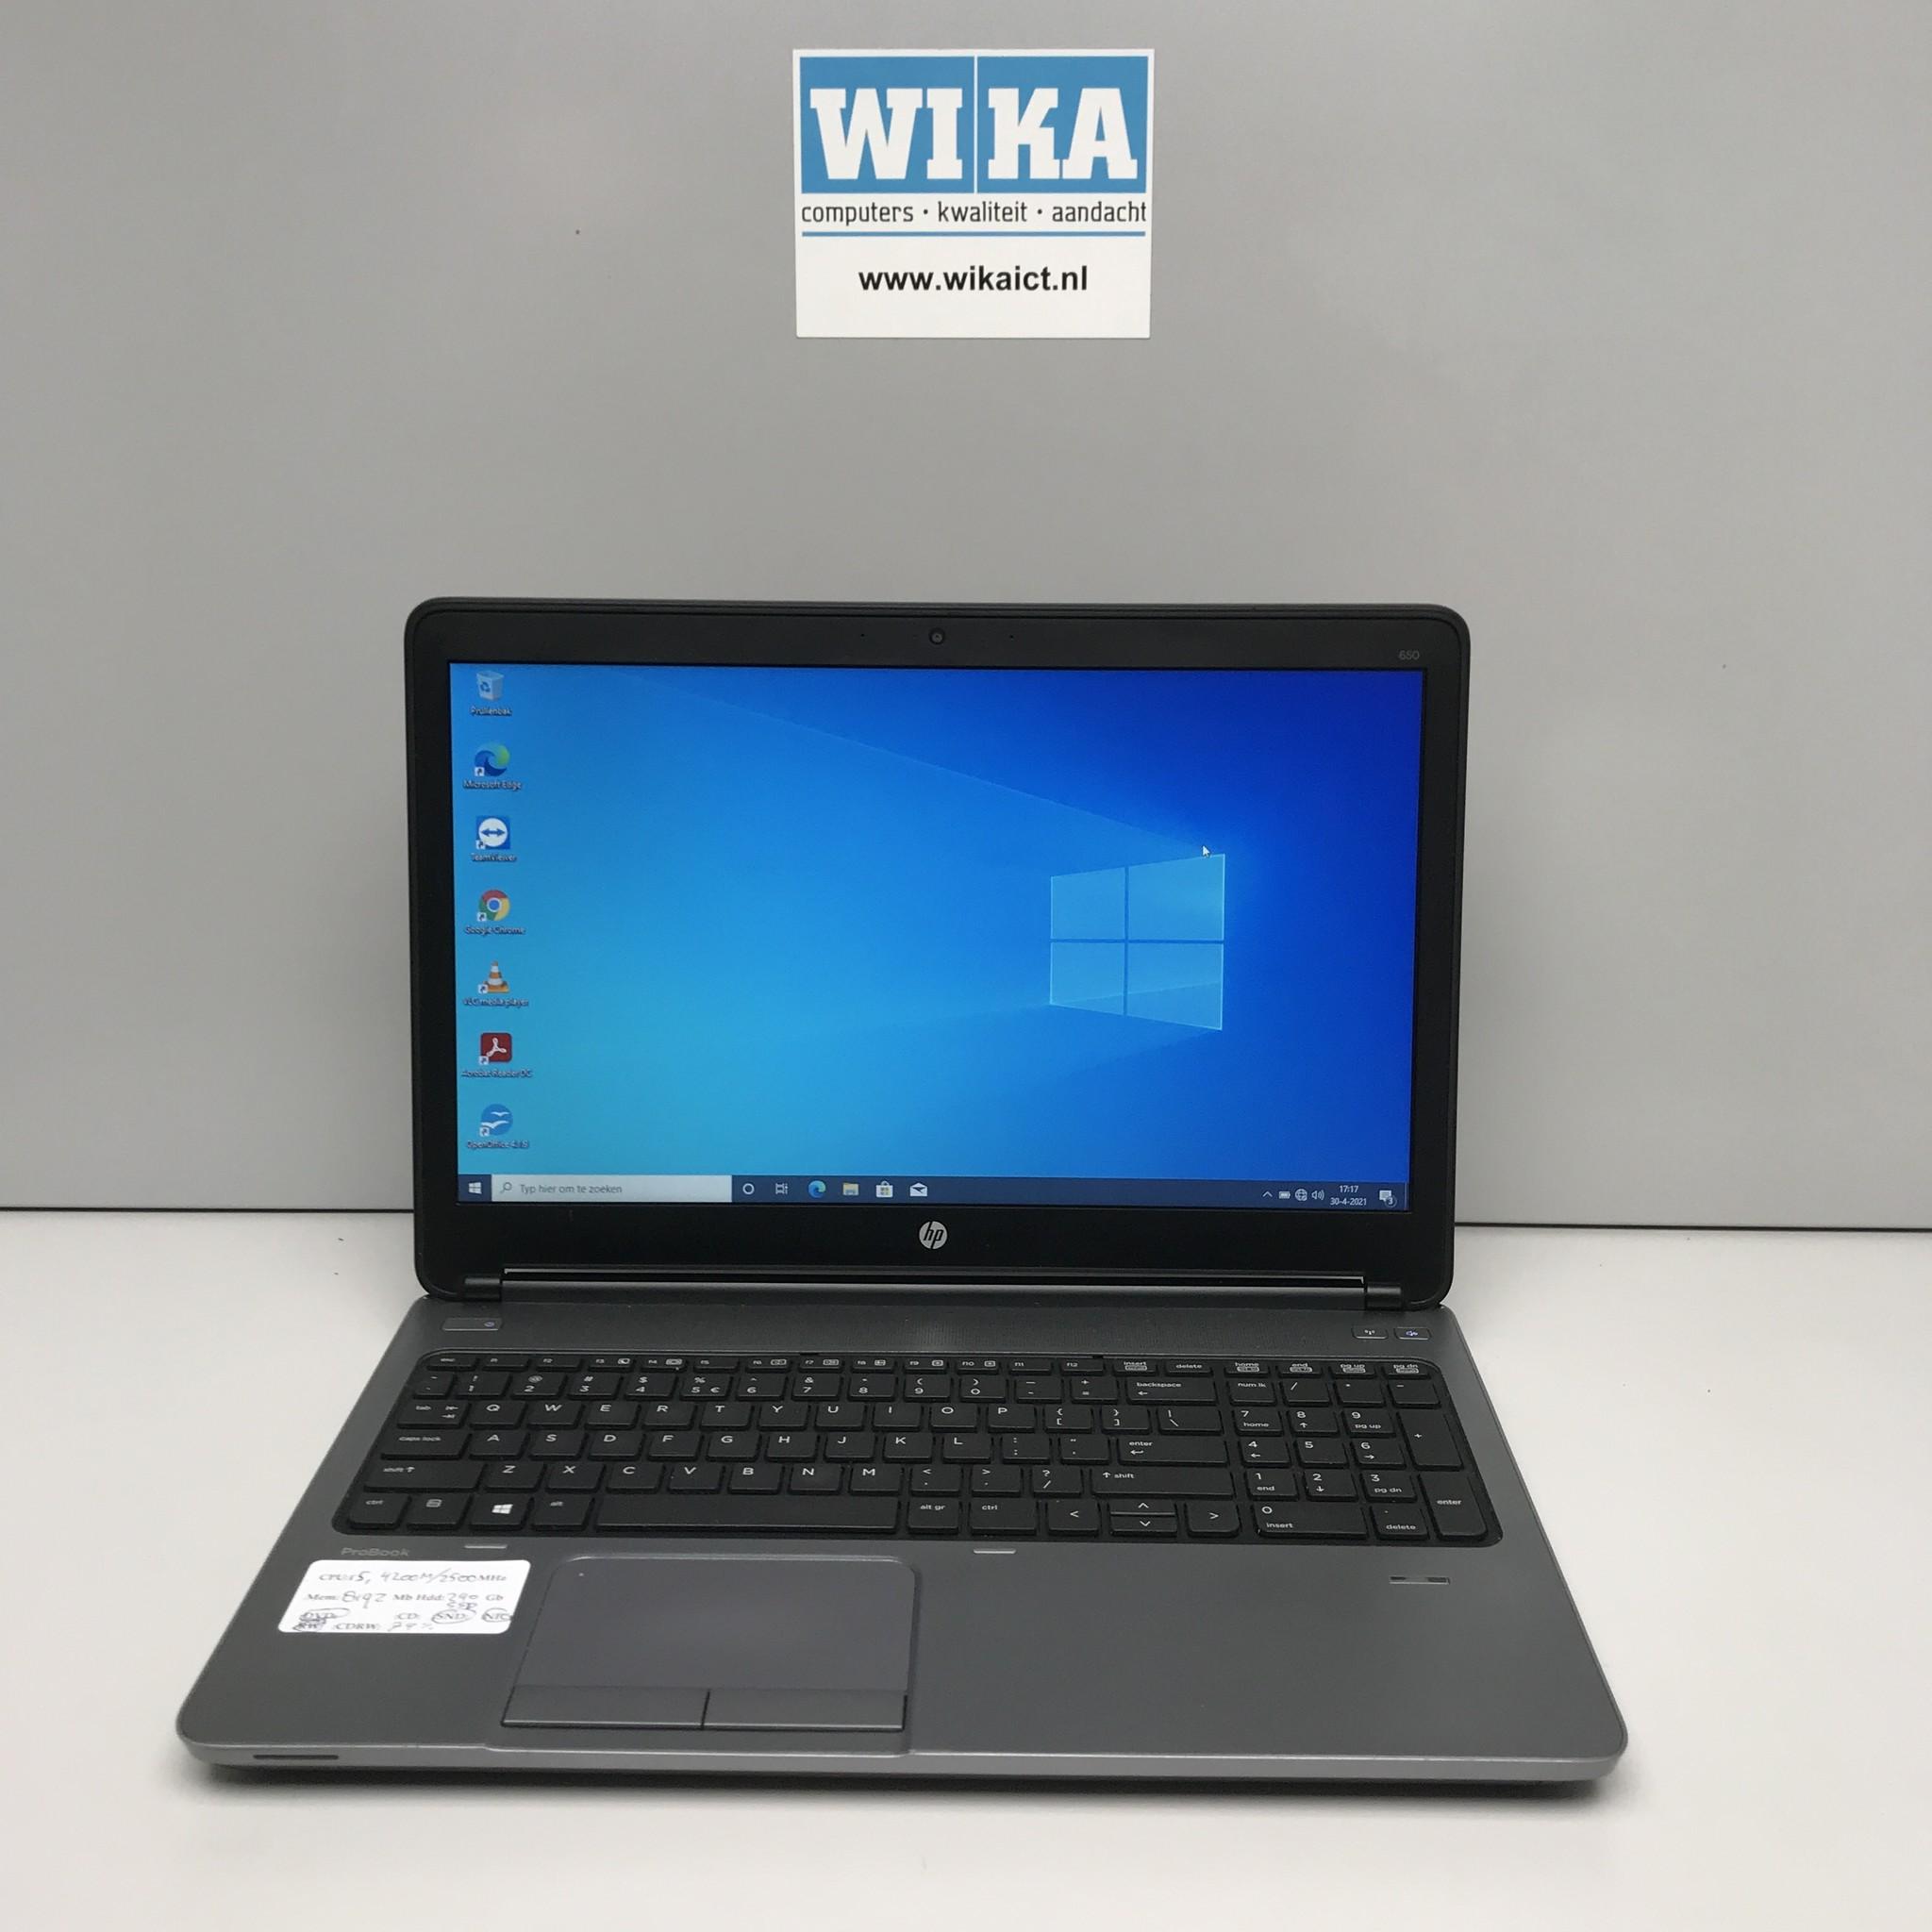 HP Probook 650 G1 i5-4200M 8Gb 240 gb SSD 15.6 laptop